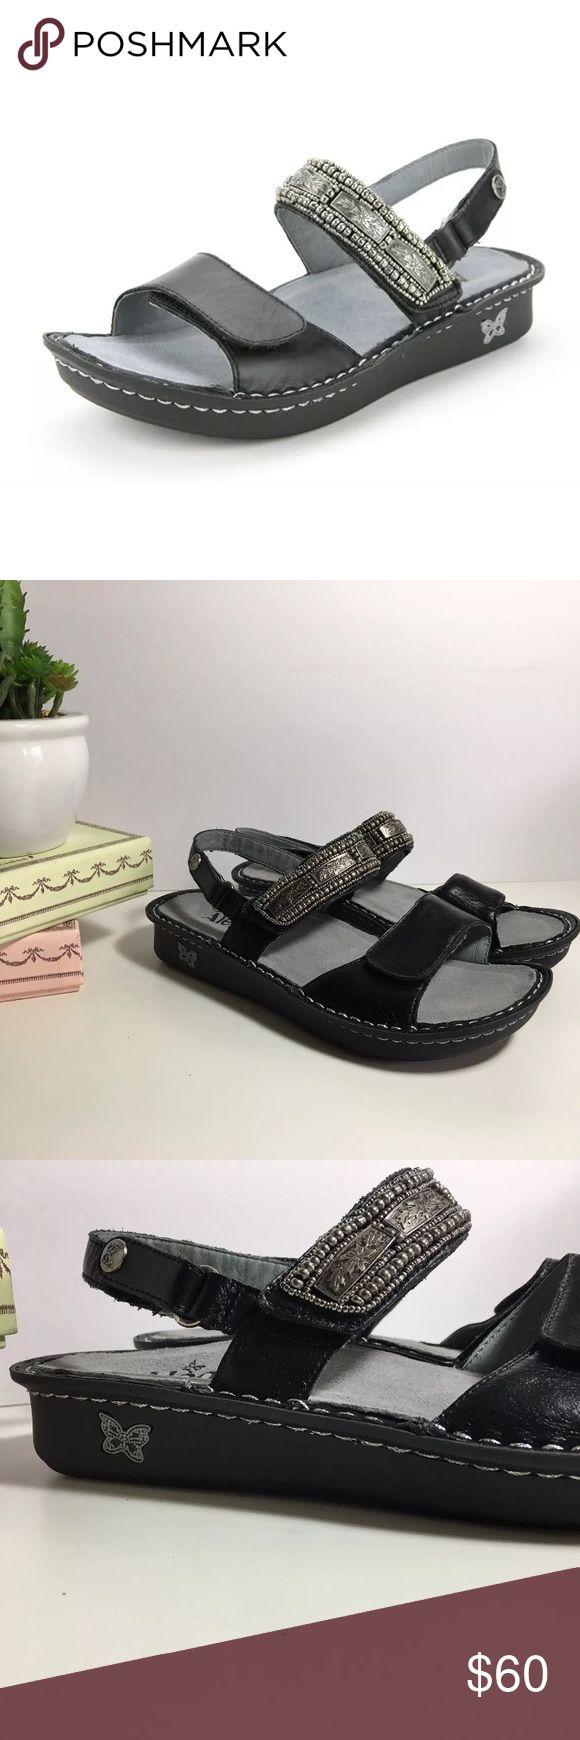 Alegria Verona Antique Pewter Sandals Sz 38 7.5/8 NWOT. never worn just tried on. Alegria Shoes Sandals